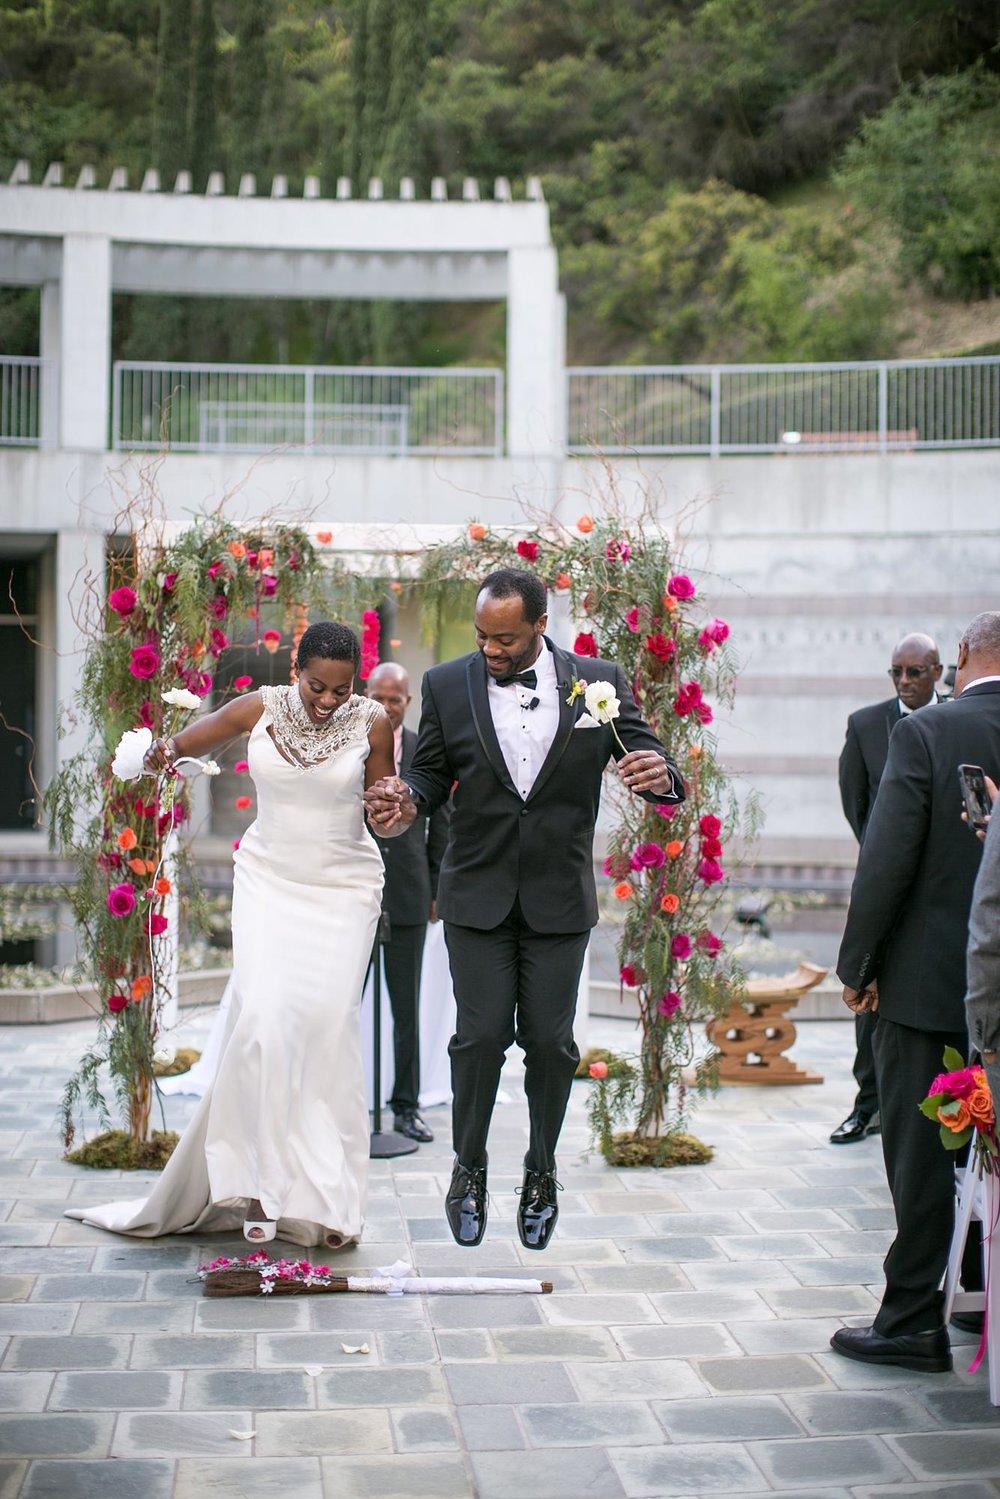 Skirball Cultural Center Wedding | Miki & Sonja Photography | mikiandsonja.comSkirball Cultural Center Wedding | Miki & Sonja Photography | mikiandsonja.com